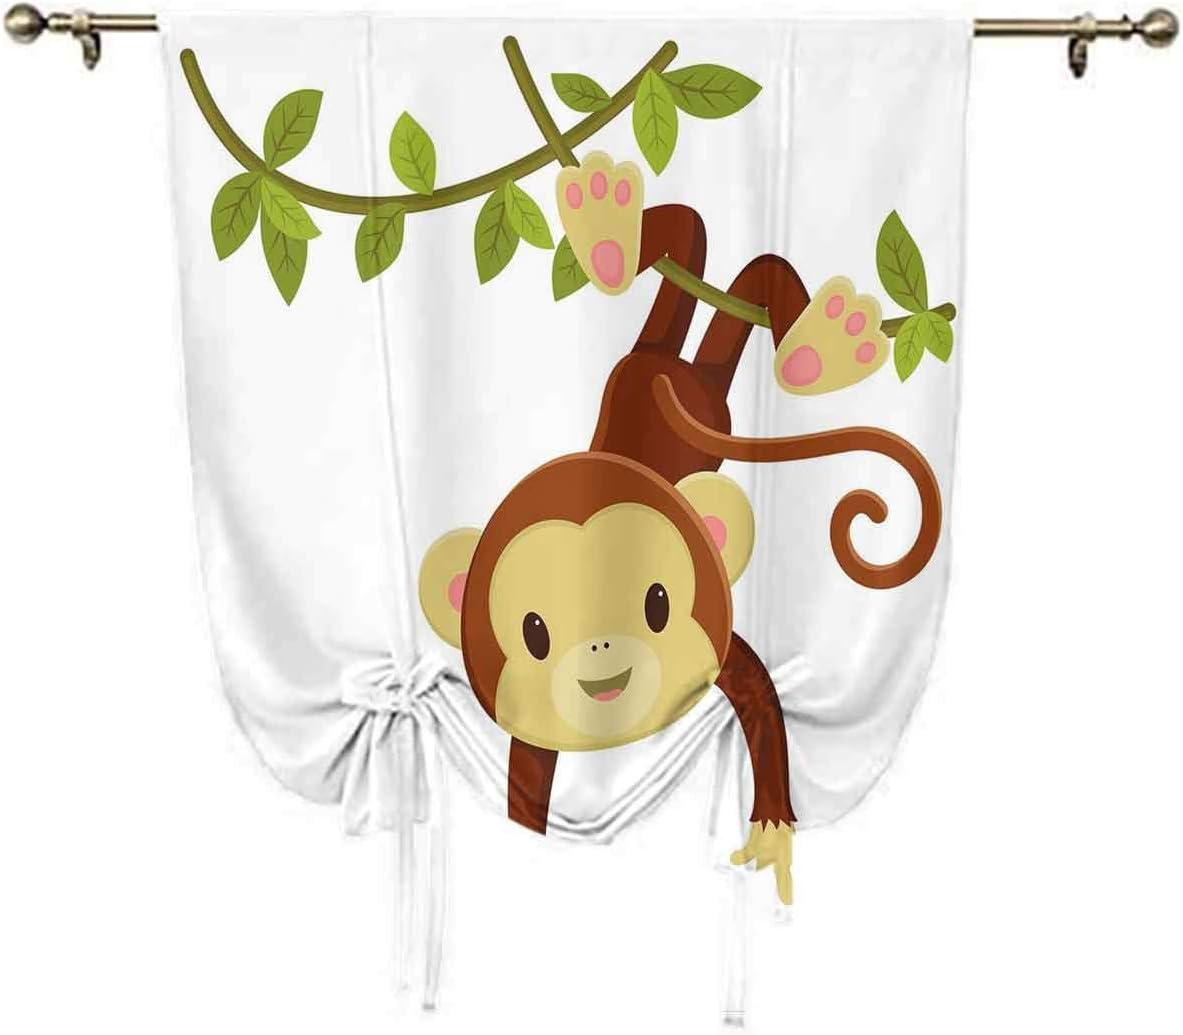 Nursery Small Window Curtain,Cute Cartoon Monkey Hanging on Lian